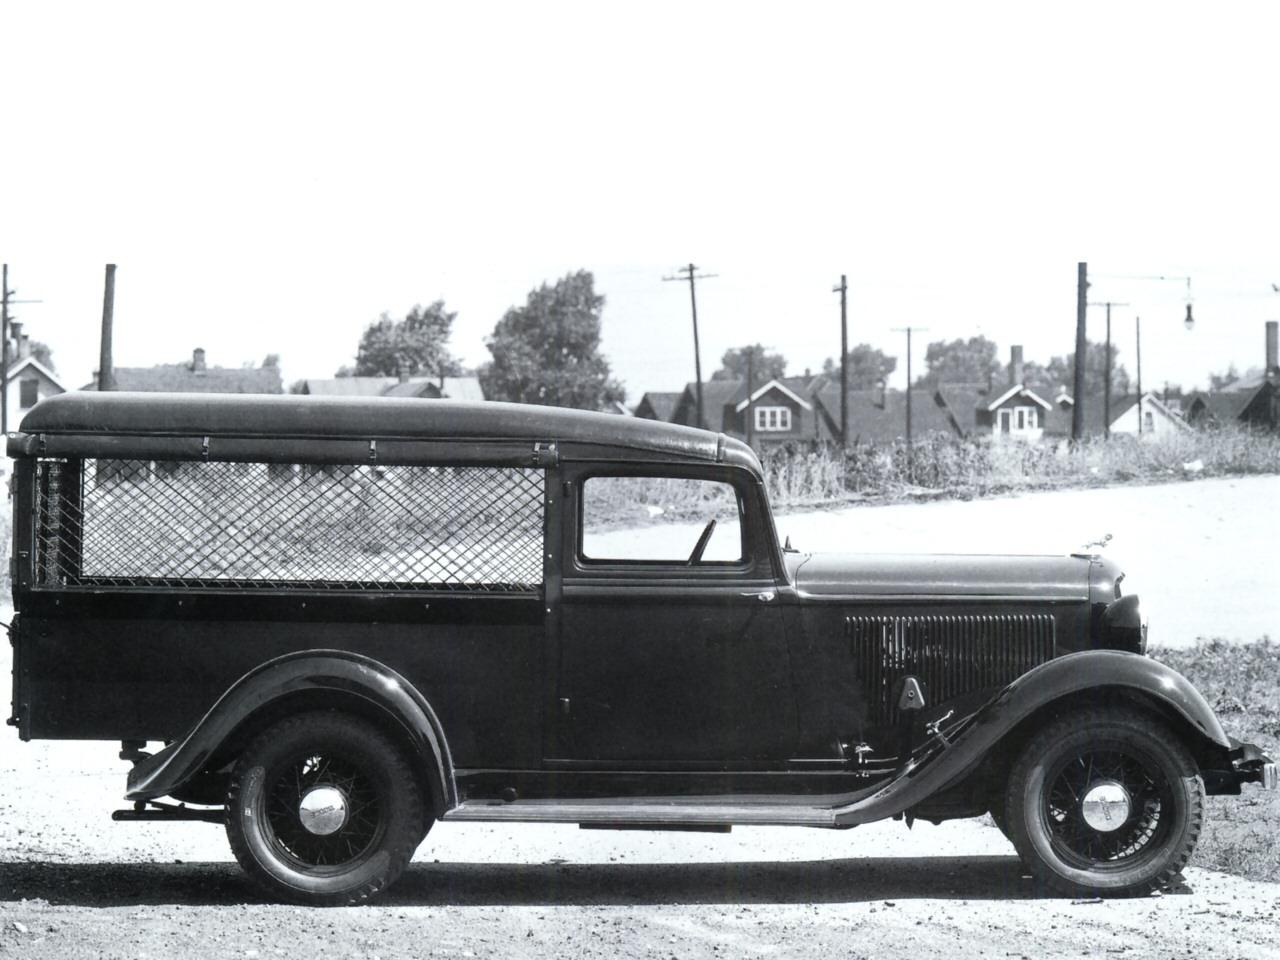 1933 Dodge Screenside Pickup Svr BW